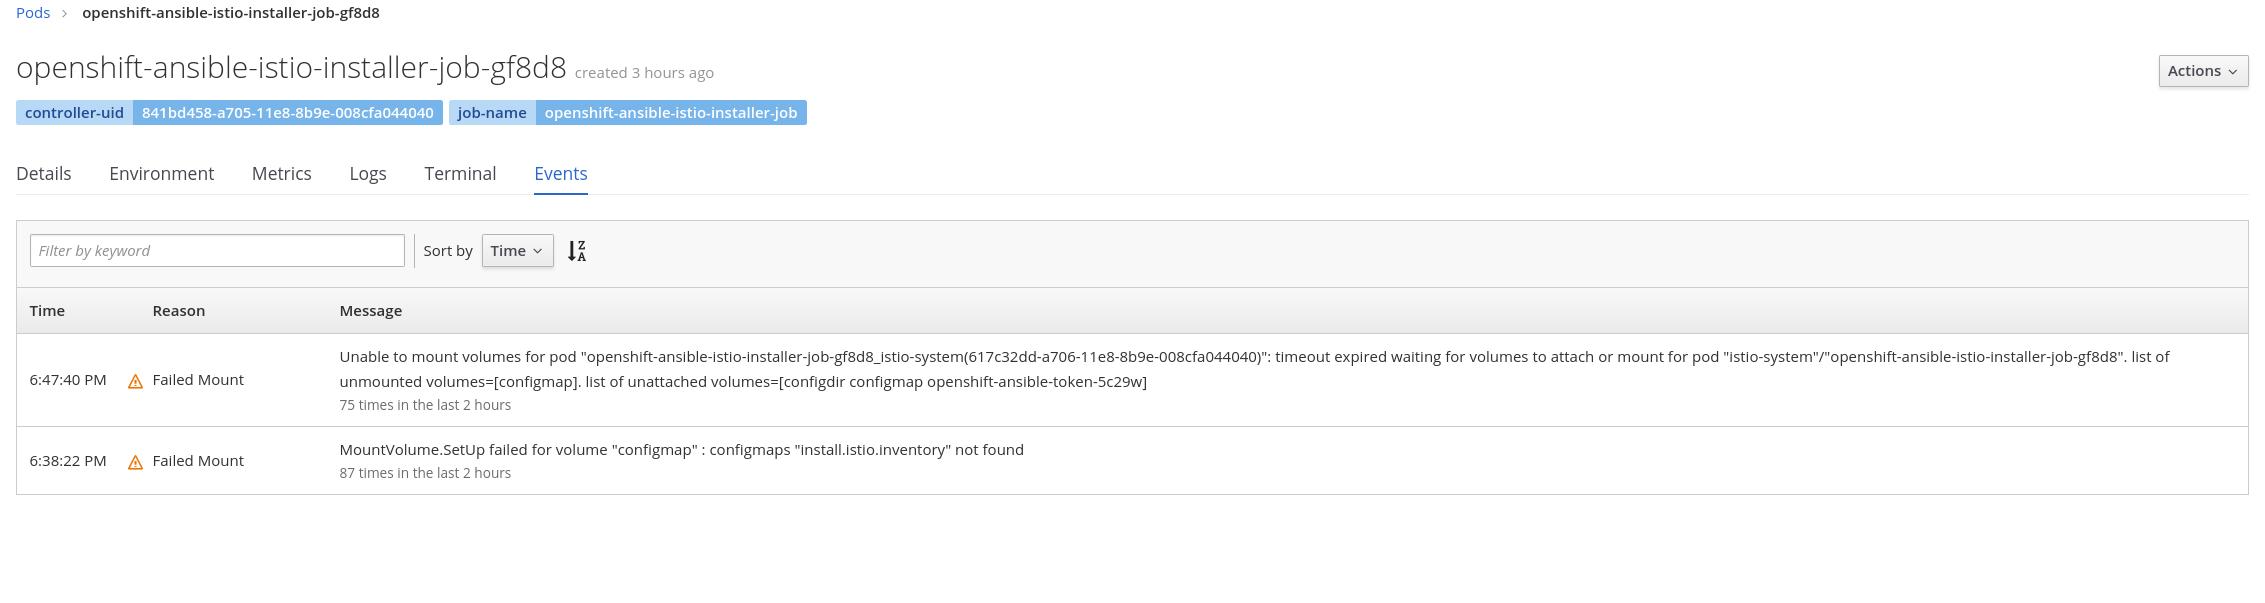 MAISTRA-5] openshift-ansible-istio-installer-job pod is not